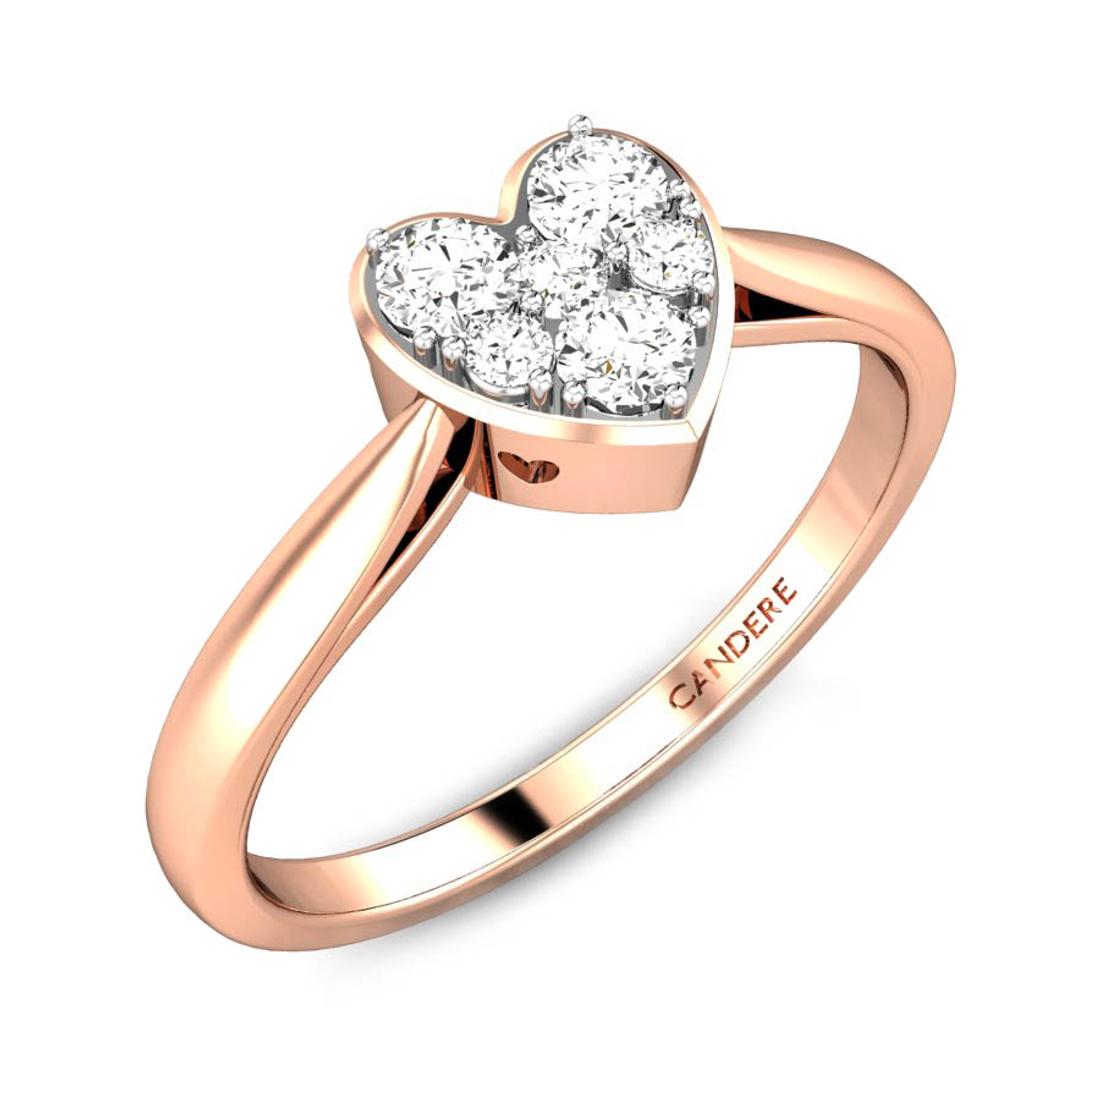 Candere By Kalyan Jewellers 14k (585) BIS Hallmark Rose Gold Heart of light Ziah Diamond Ring (IGI Certified)